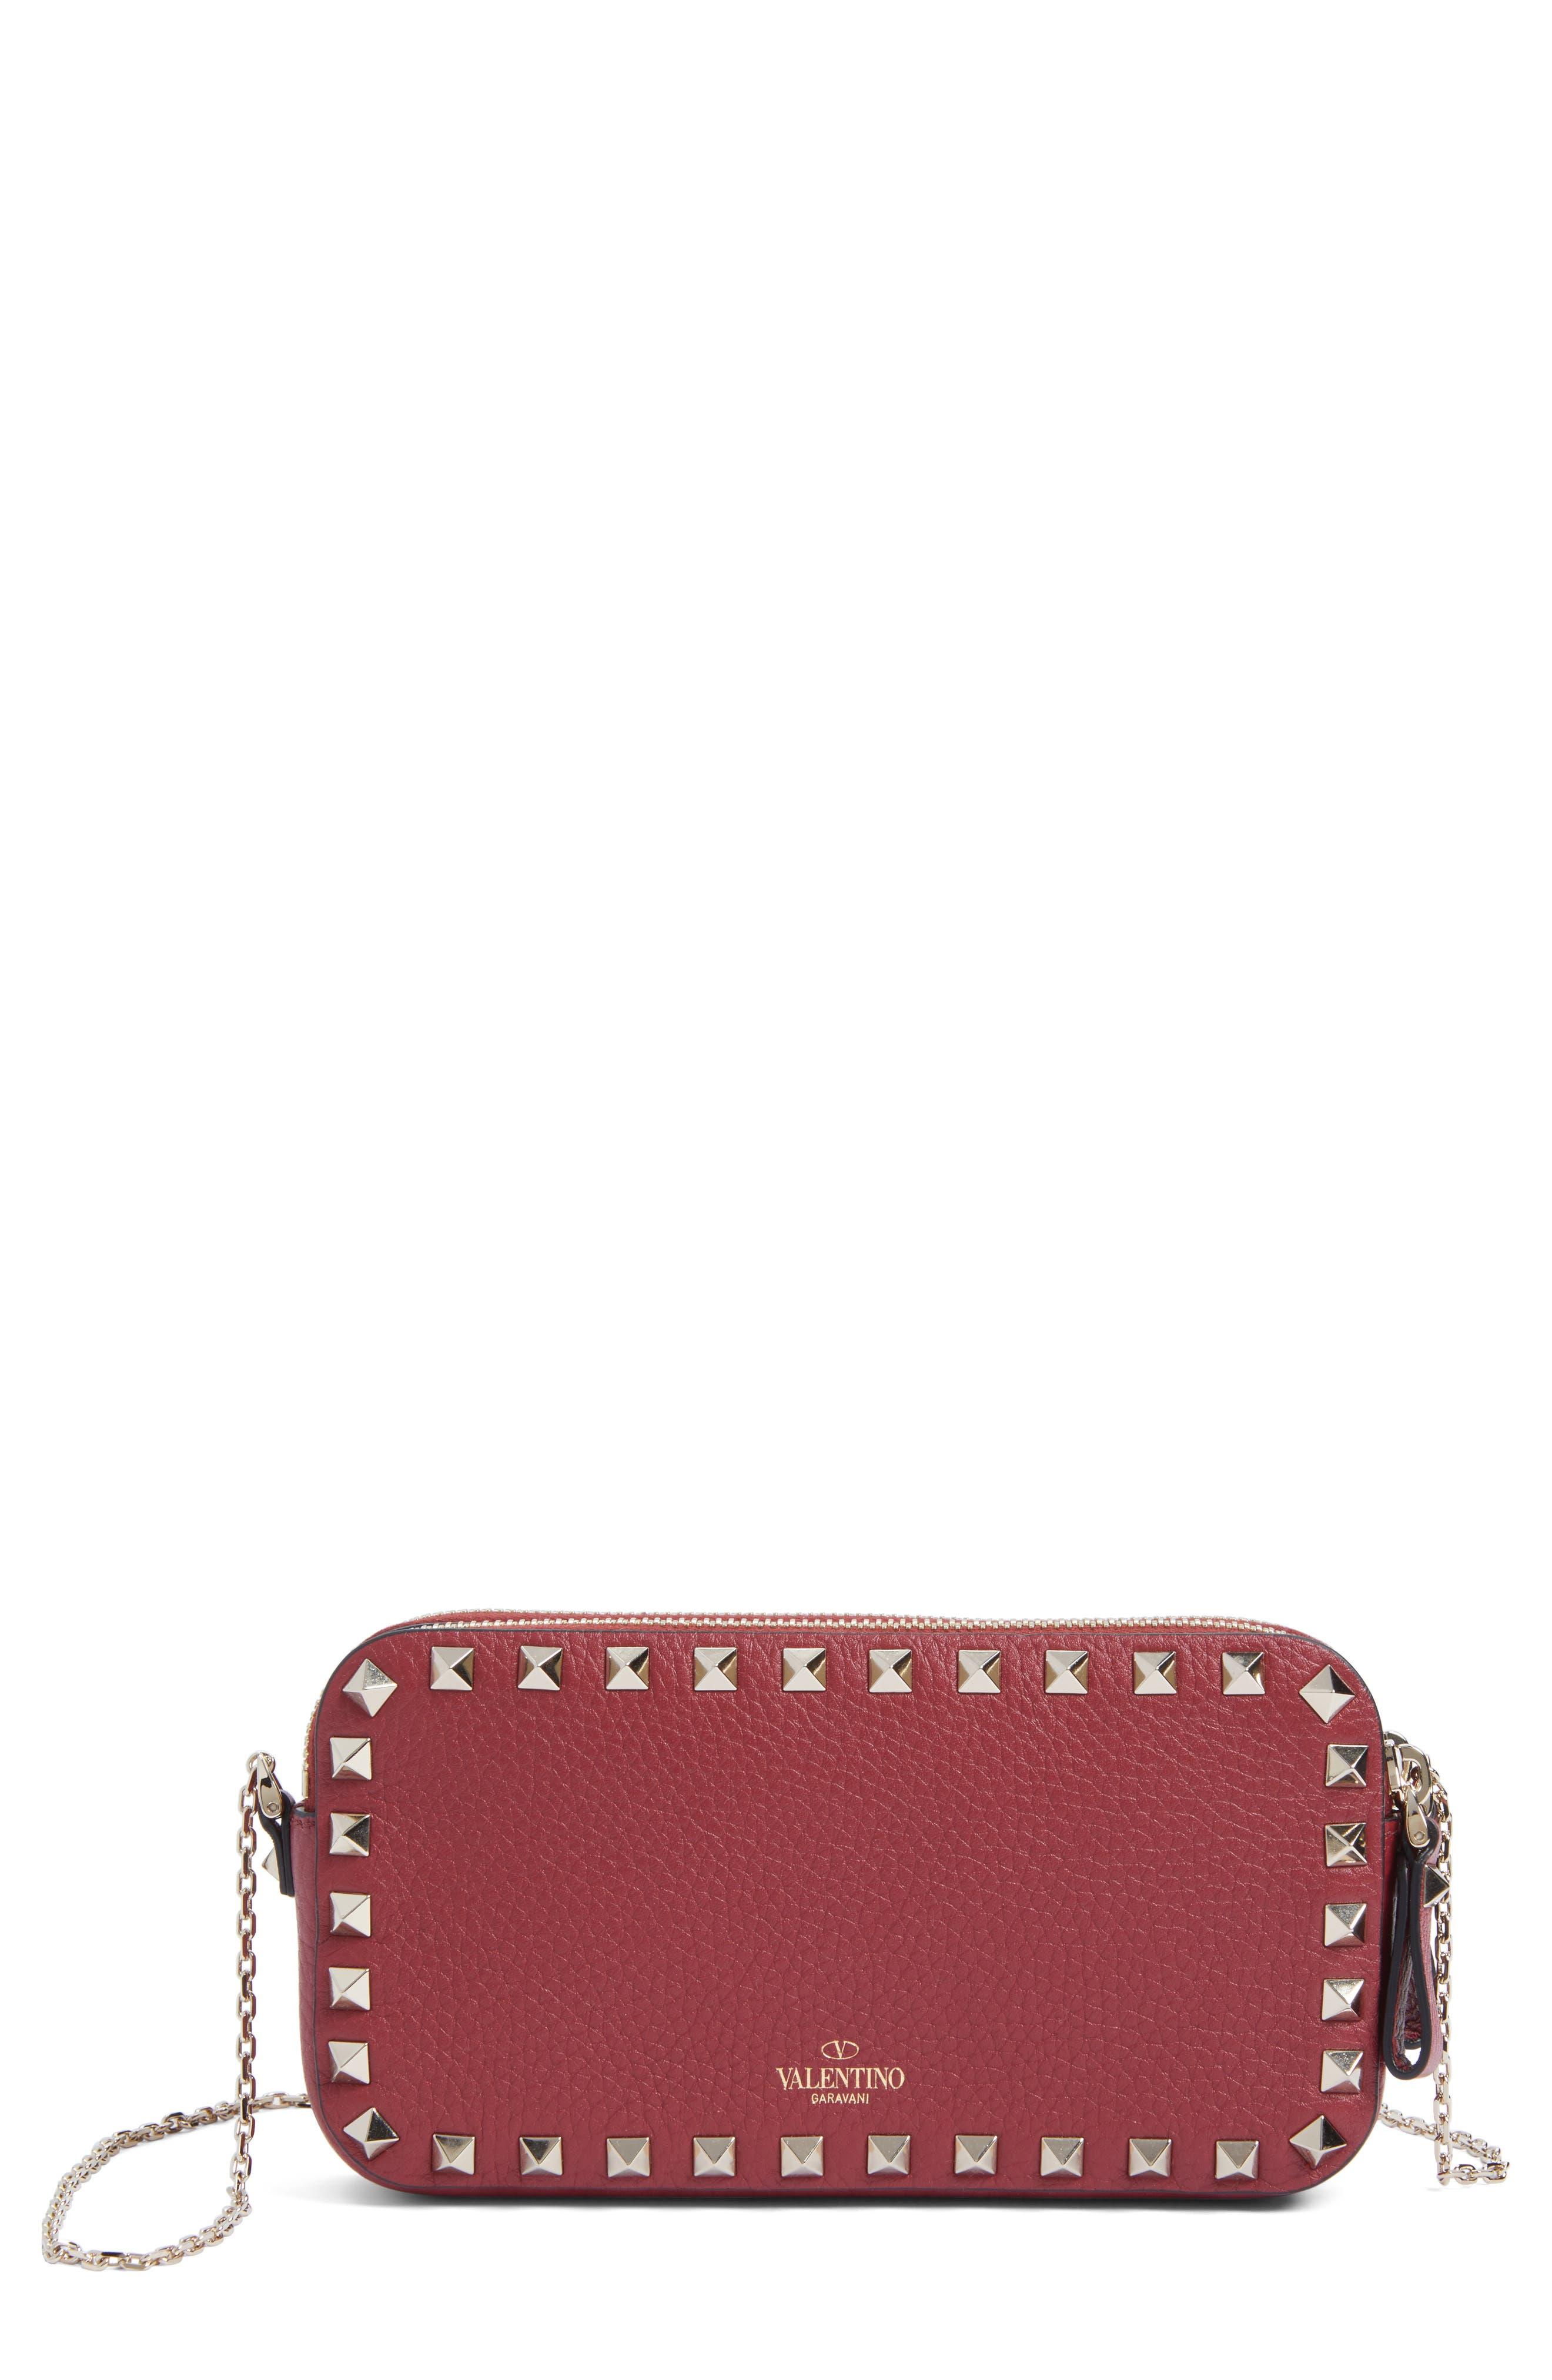 VALENTINO GARAVANI, Rockstud Leather Crossbody Bag, Main thumbnail 1, color, RUBIN